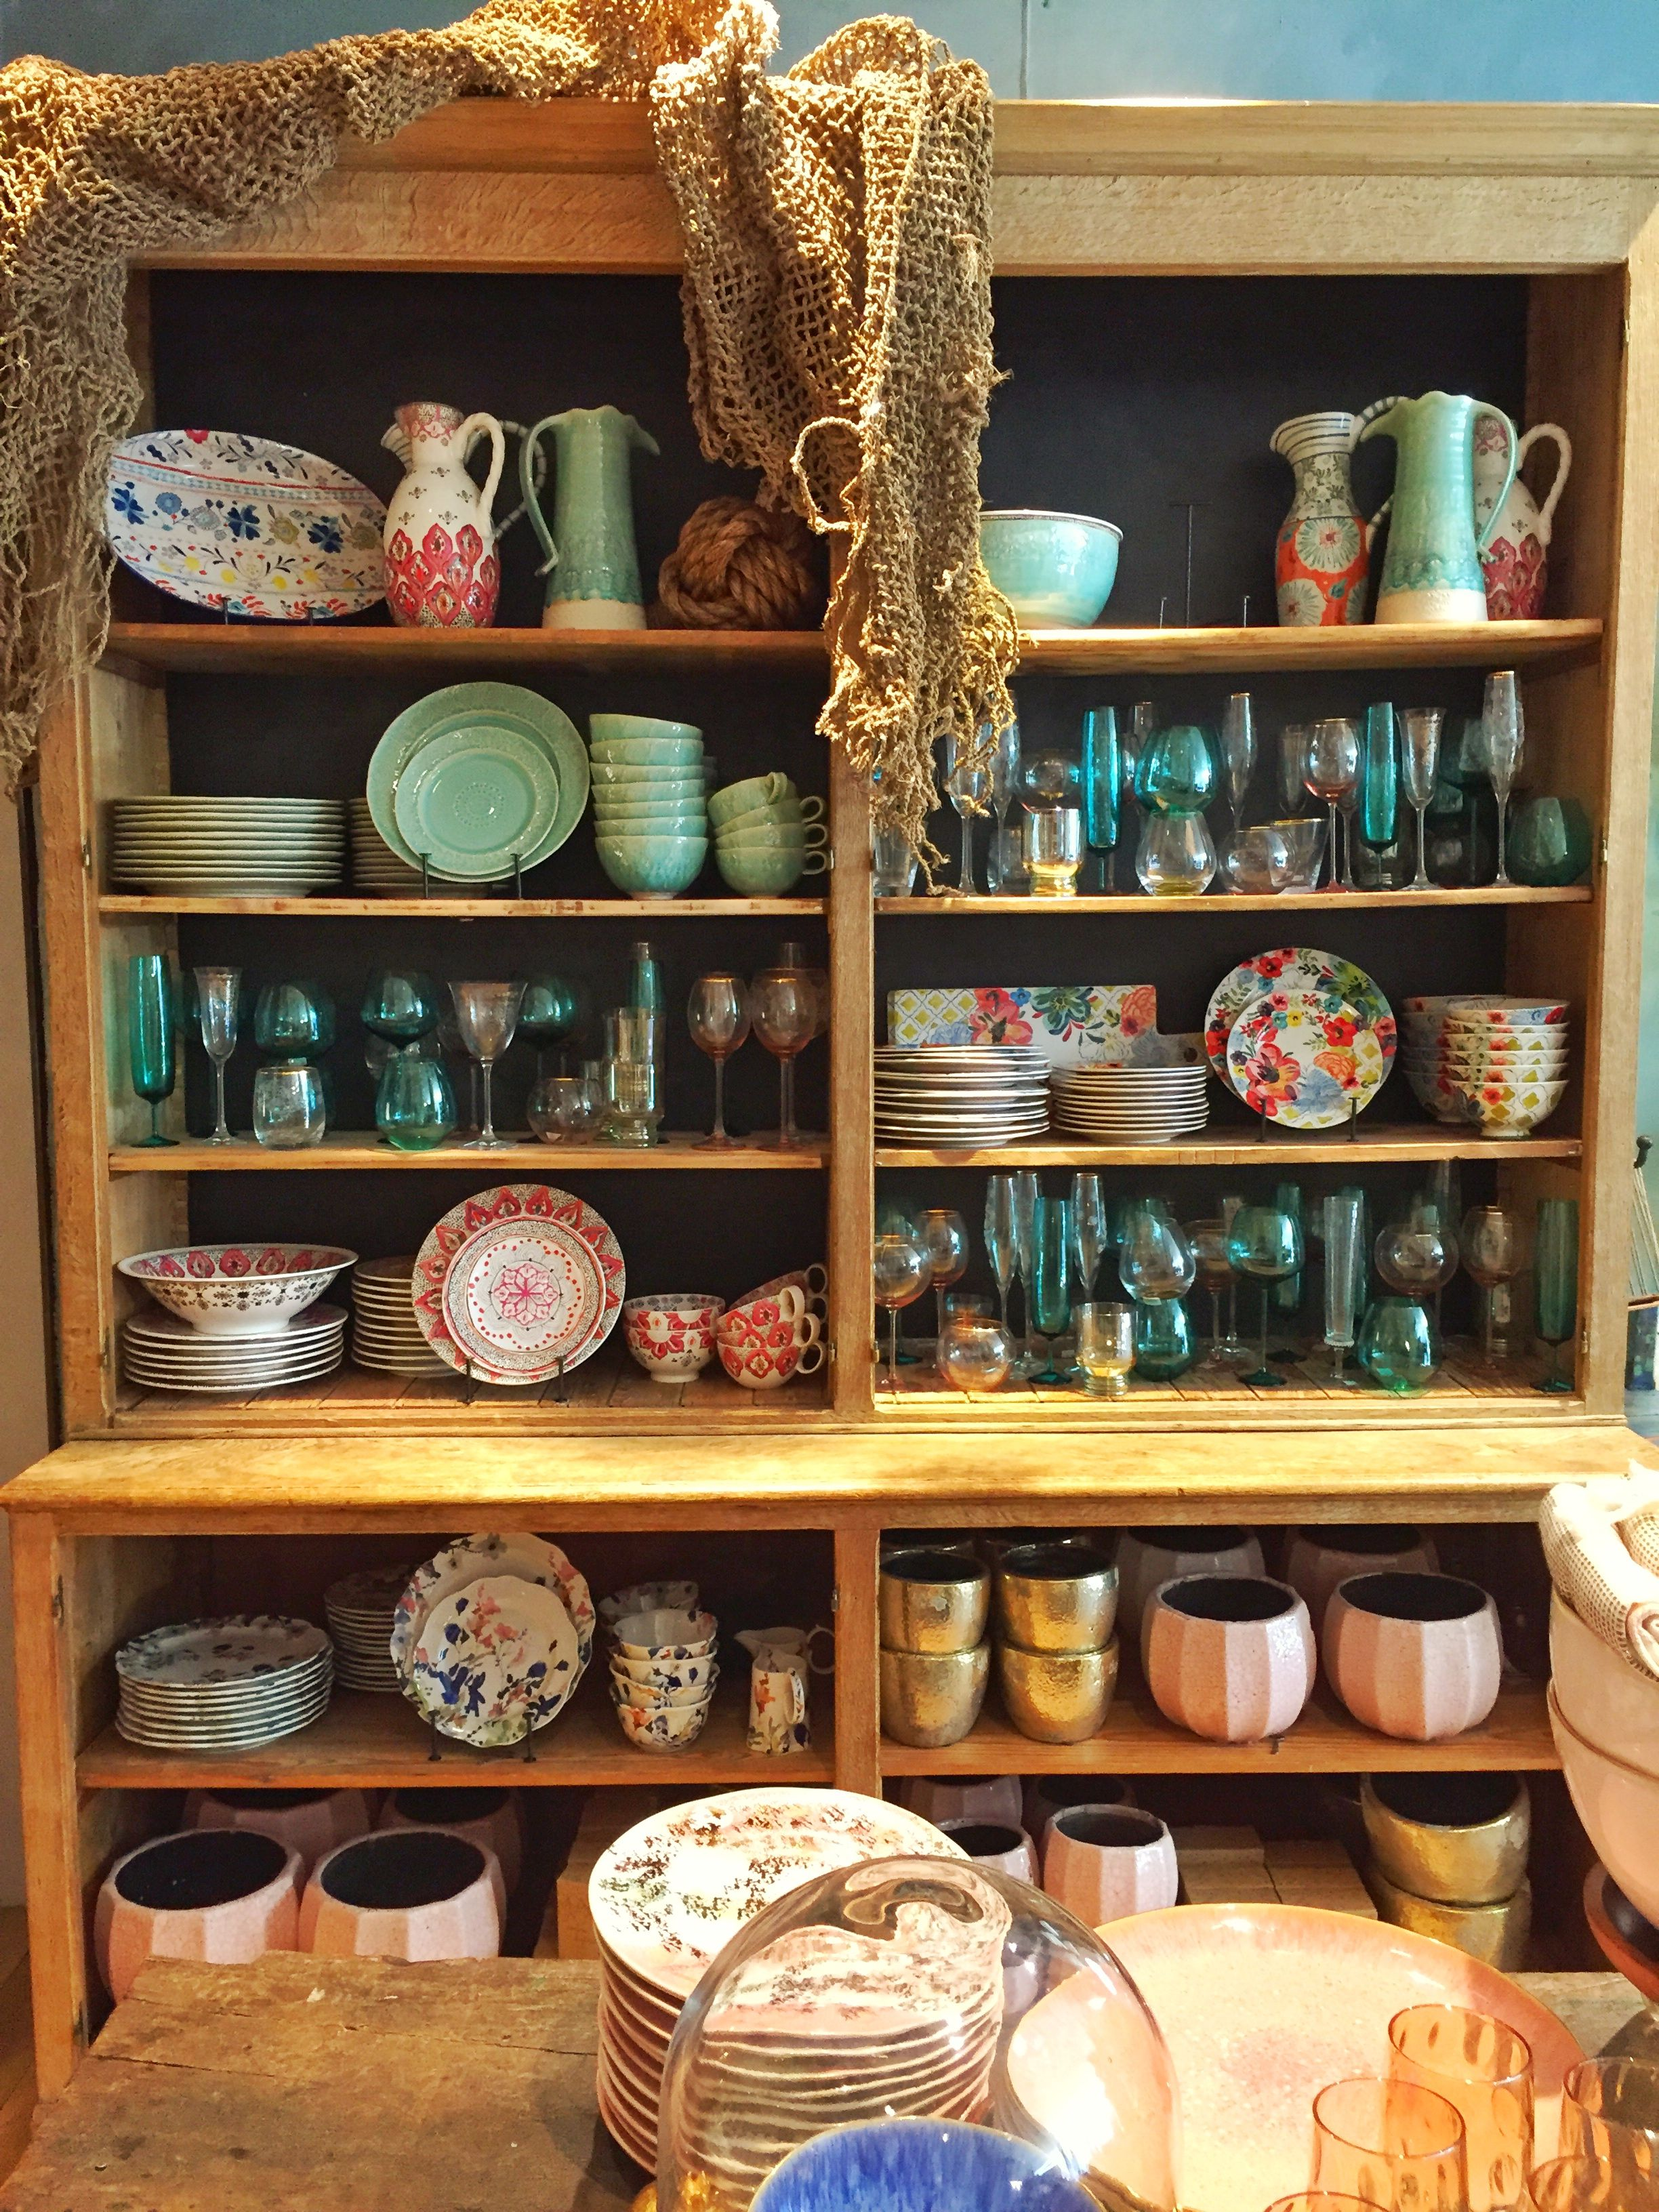 Anthropologie Home Decor Ideas Part - 47: Home Decor Inspiration At Anthropologie